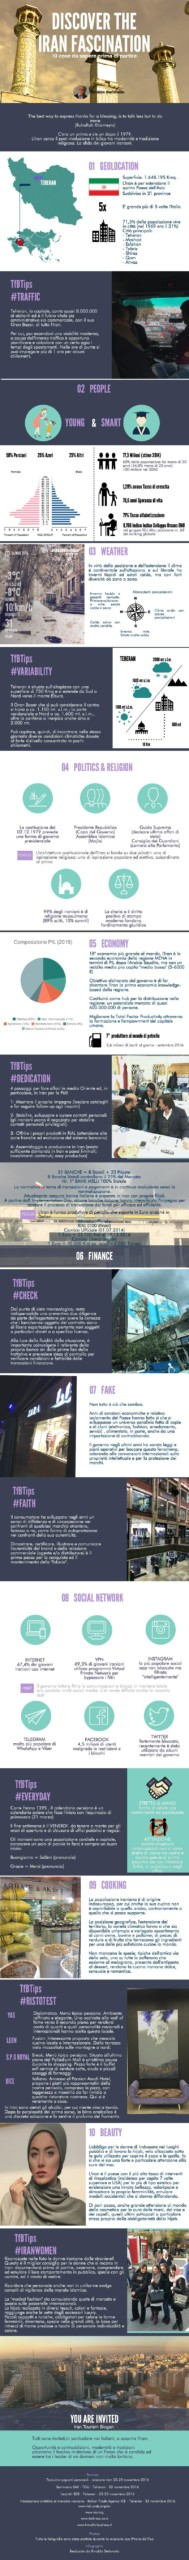 infografica-iran-travel-for-business